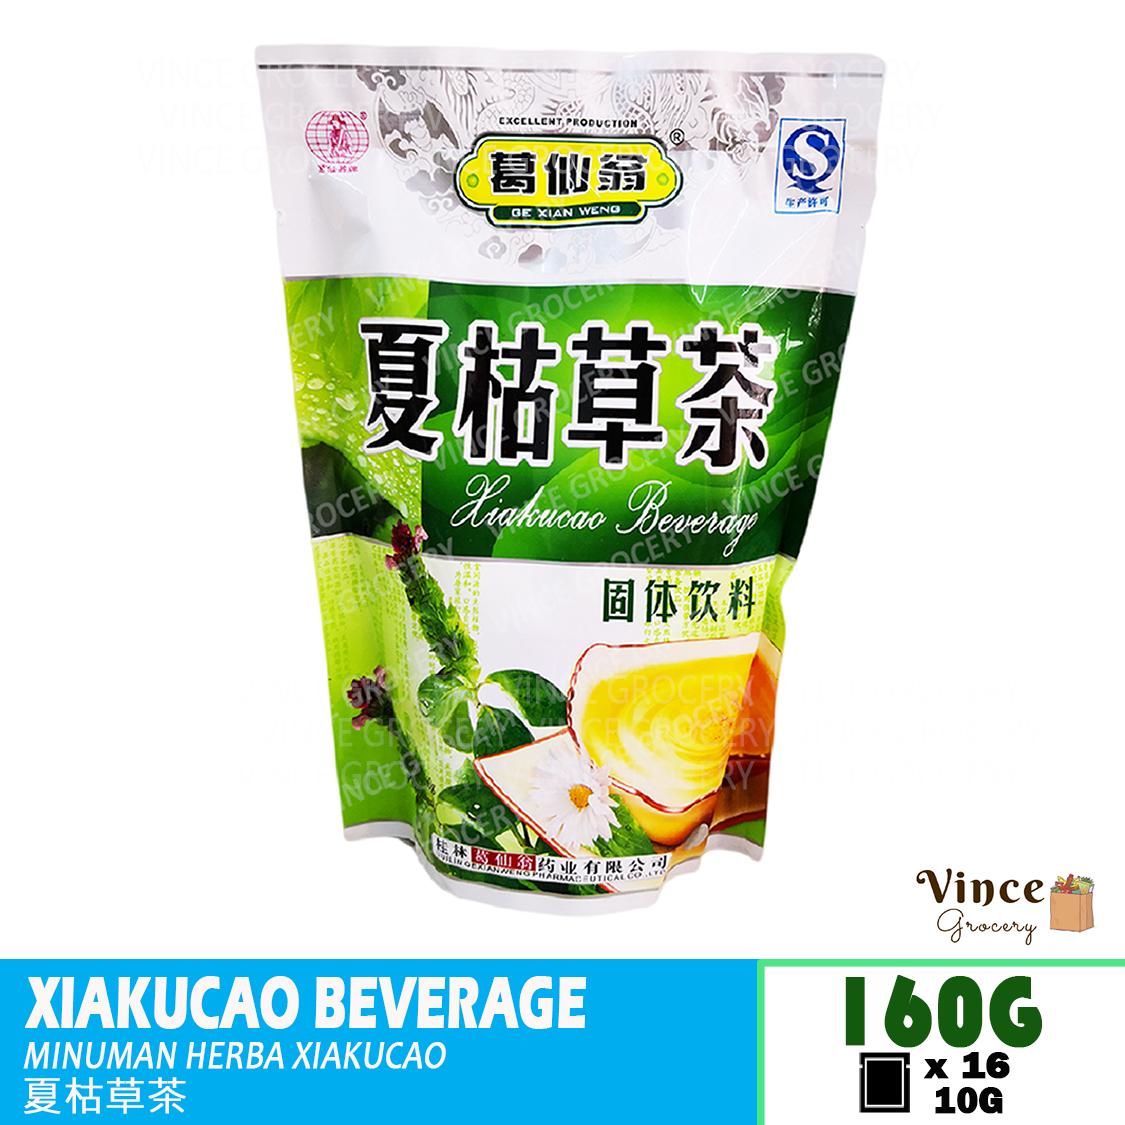 GE XIAN WENG Xiakucao (Heal-all) Beverage  葛仙翁夏古草茶 160G (16's x 10G)